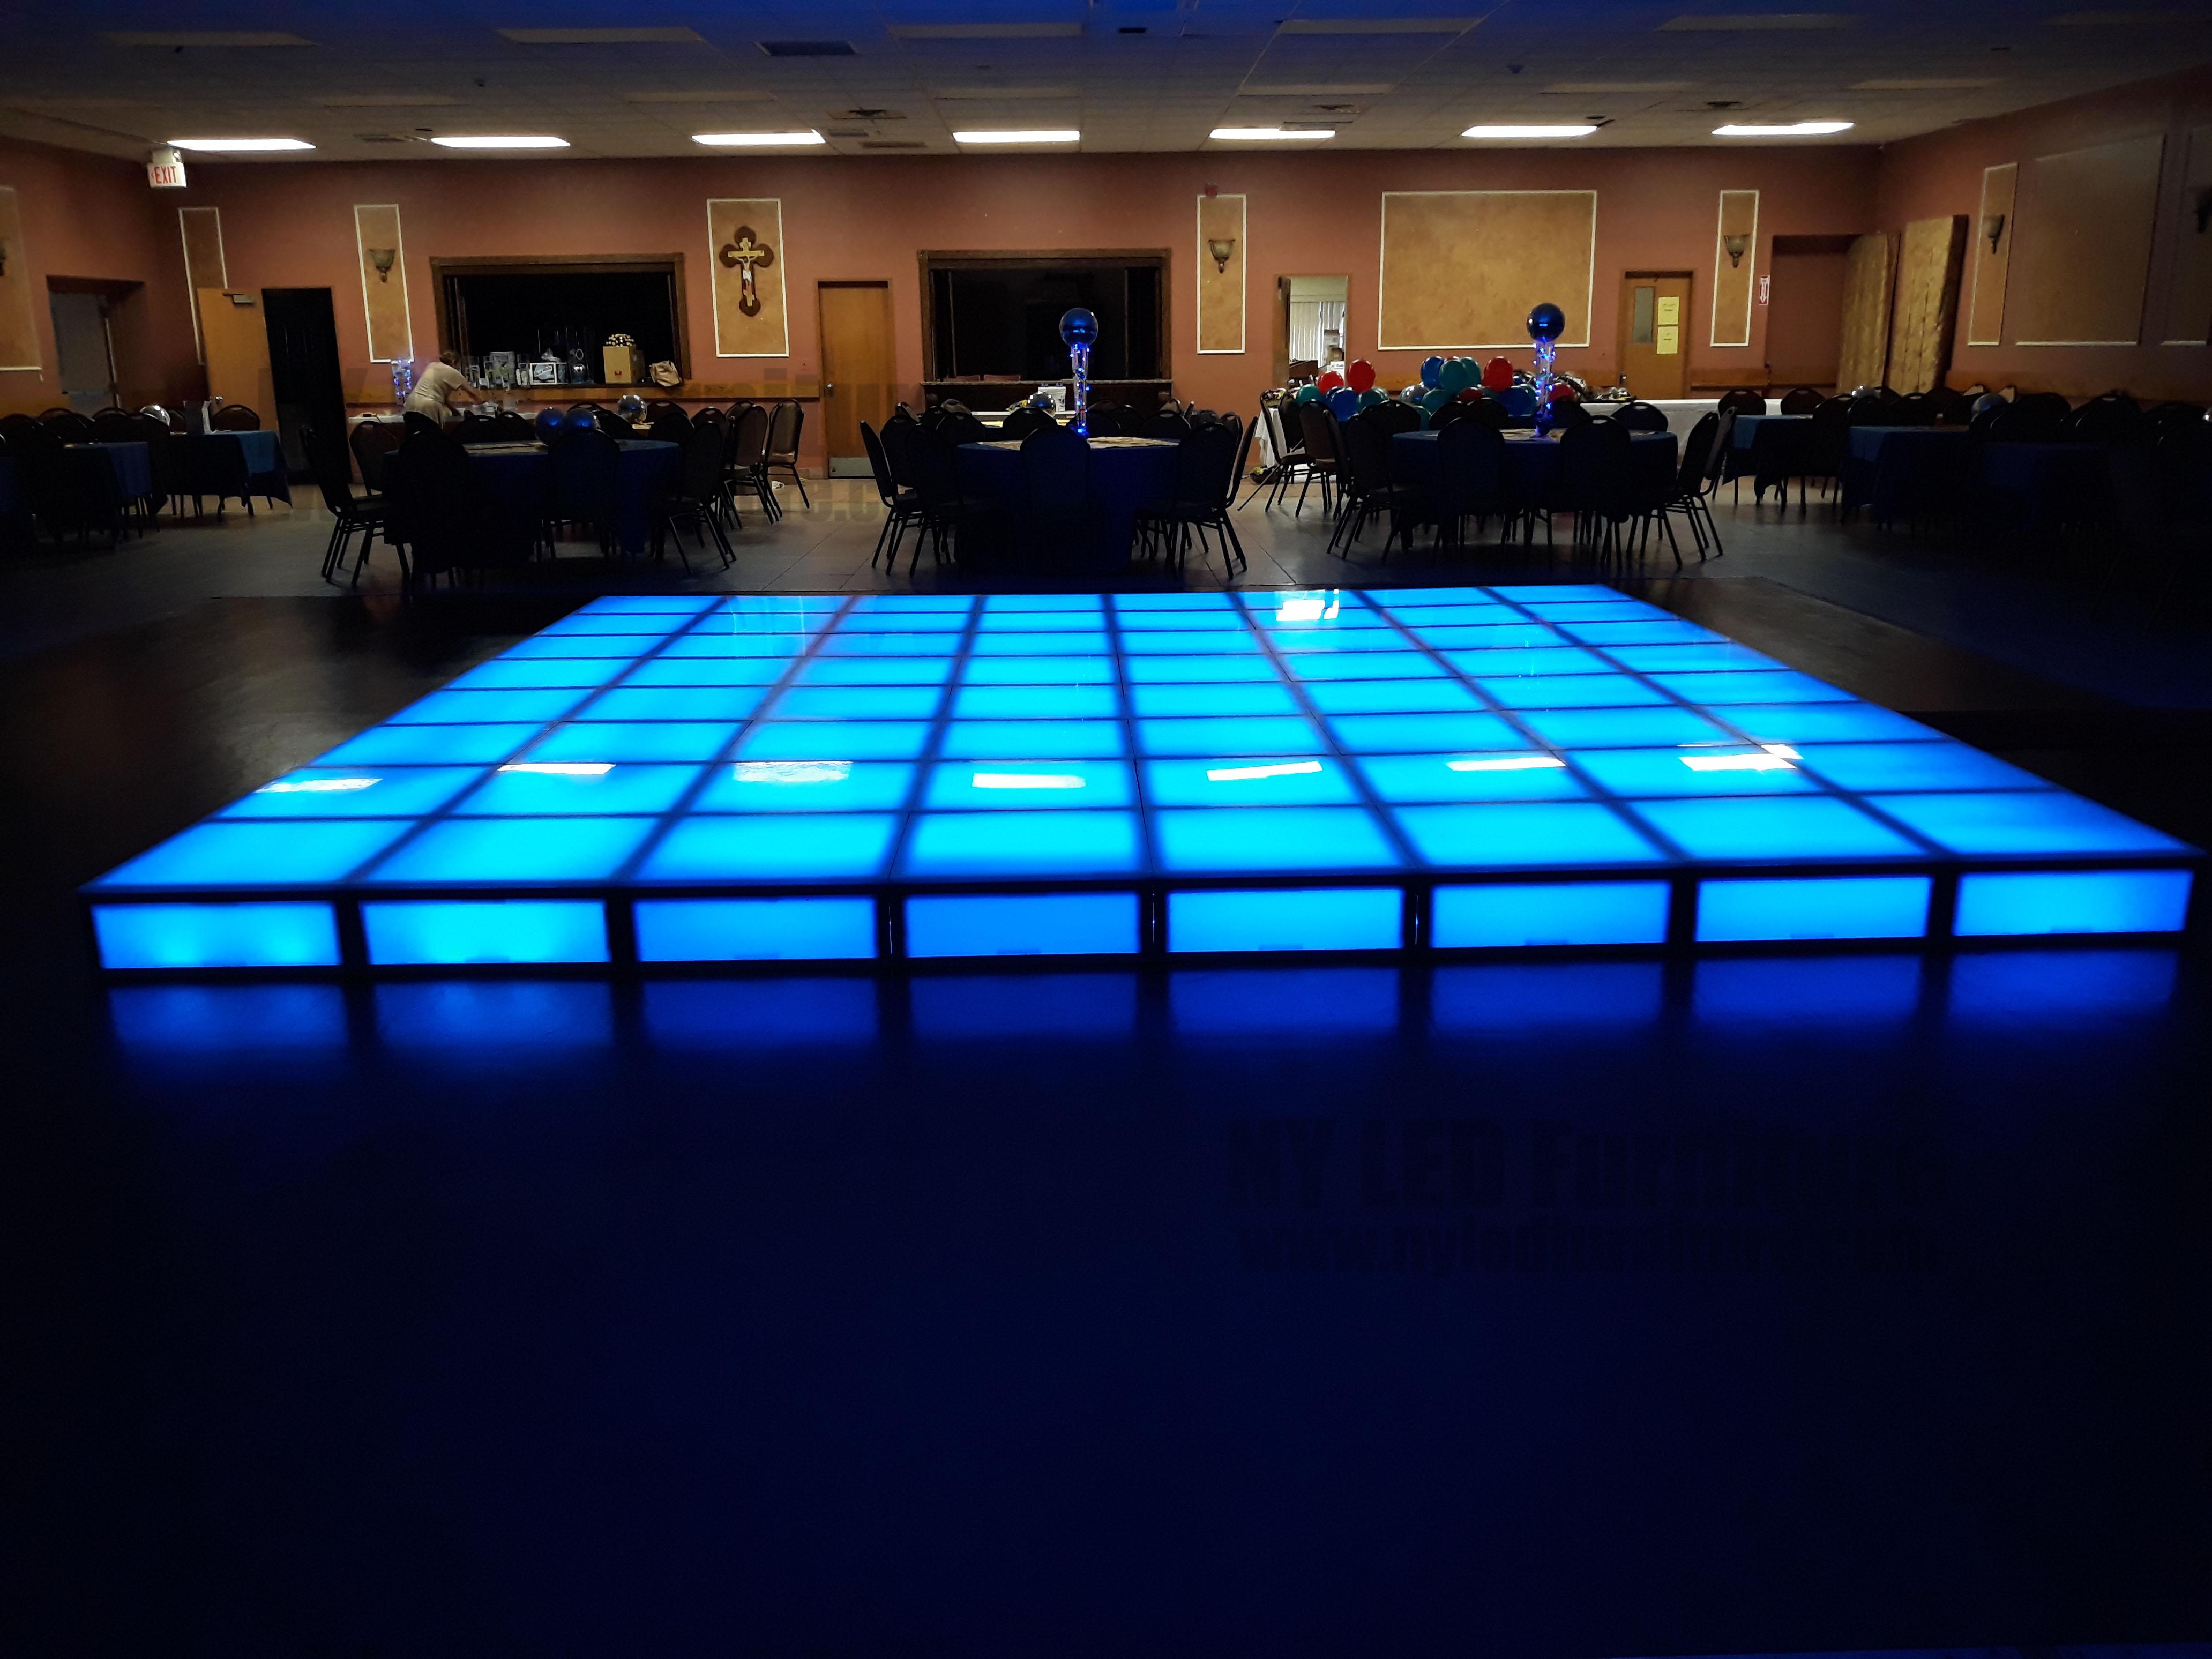 best lighted dance floor rental in long island nassau suffolk